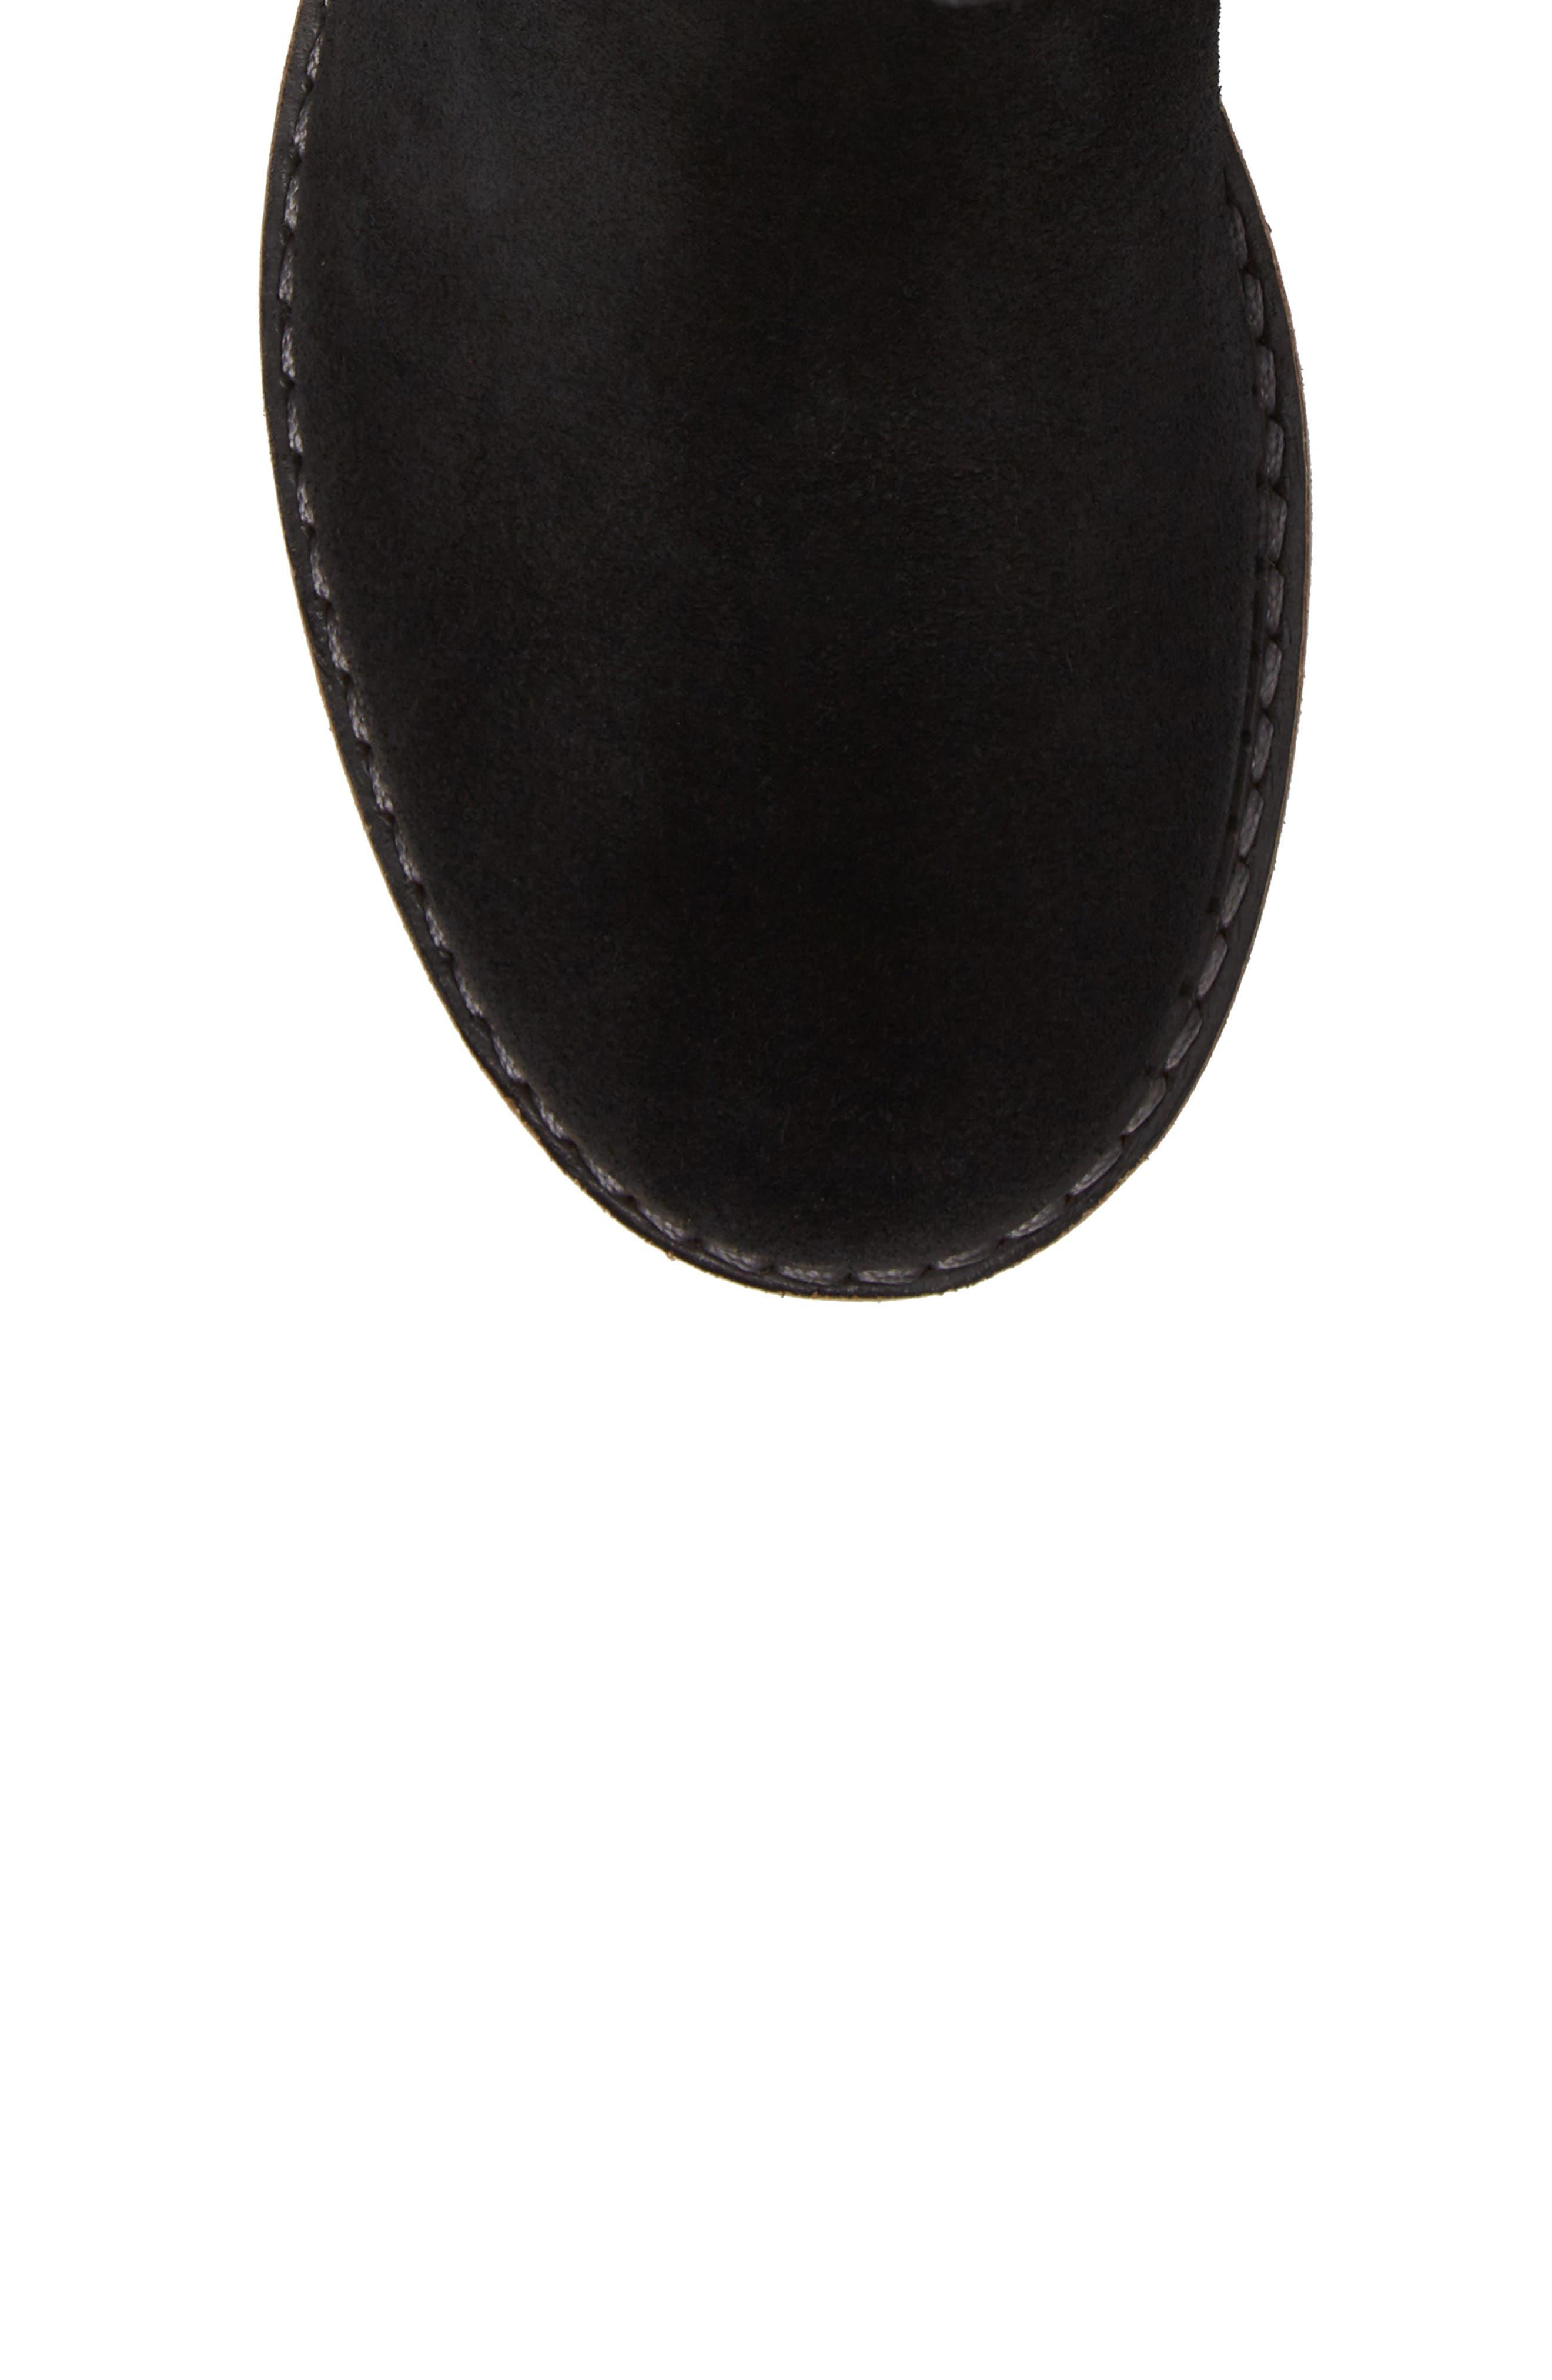 Cascade Waterproof Boot,                             Alternate thumbnail 5, color,                             Black/ Grey Suede